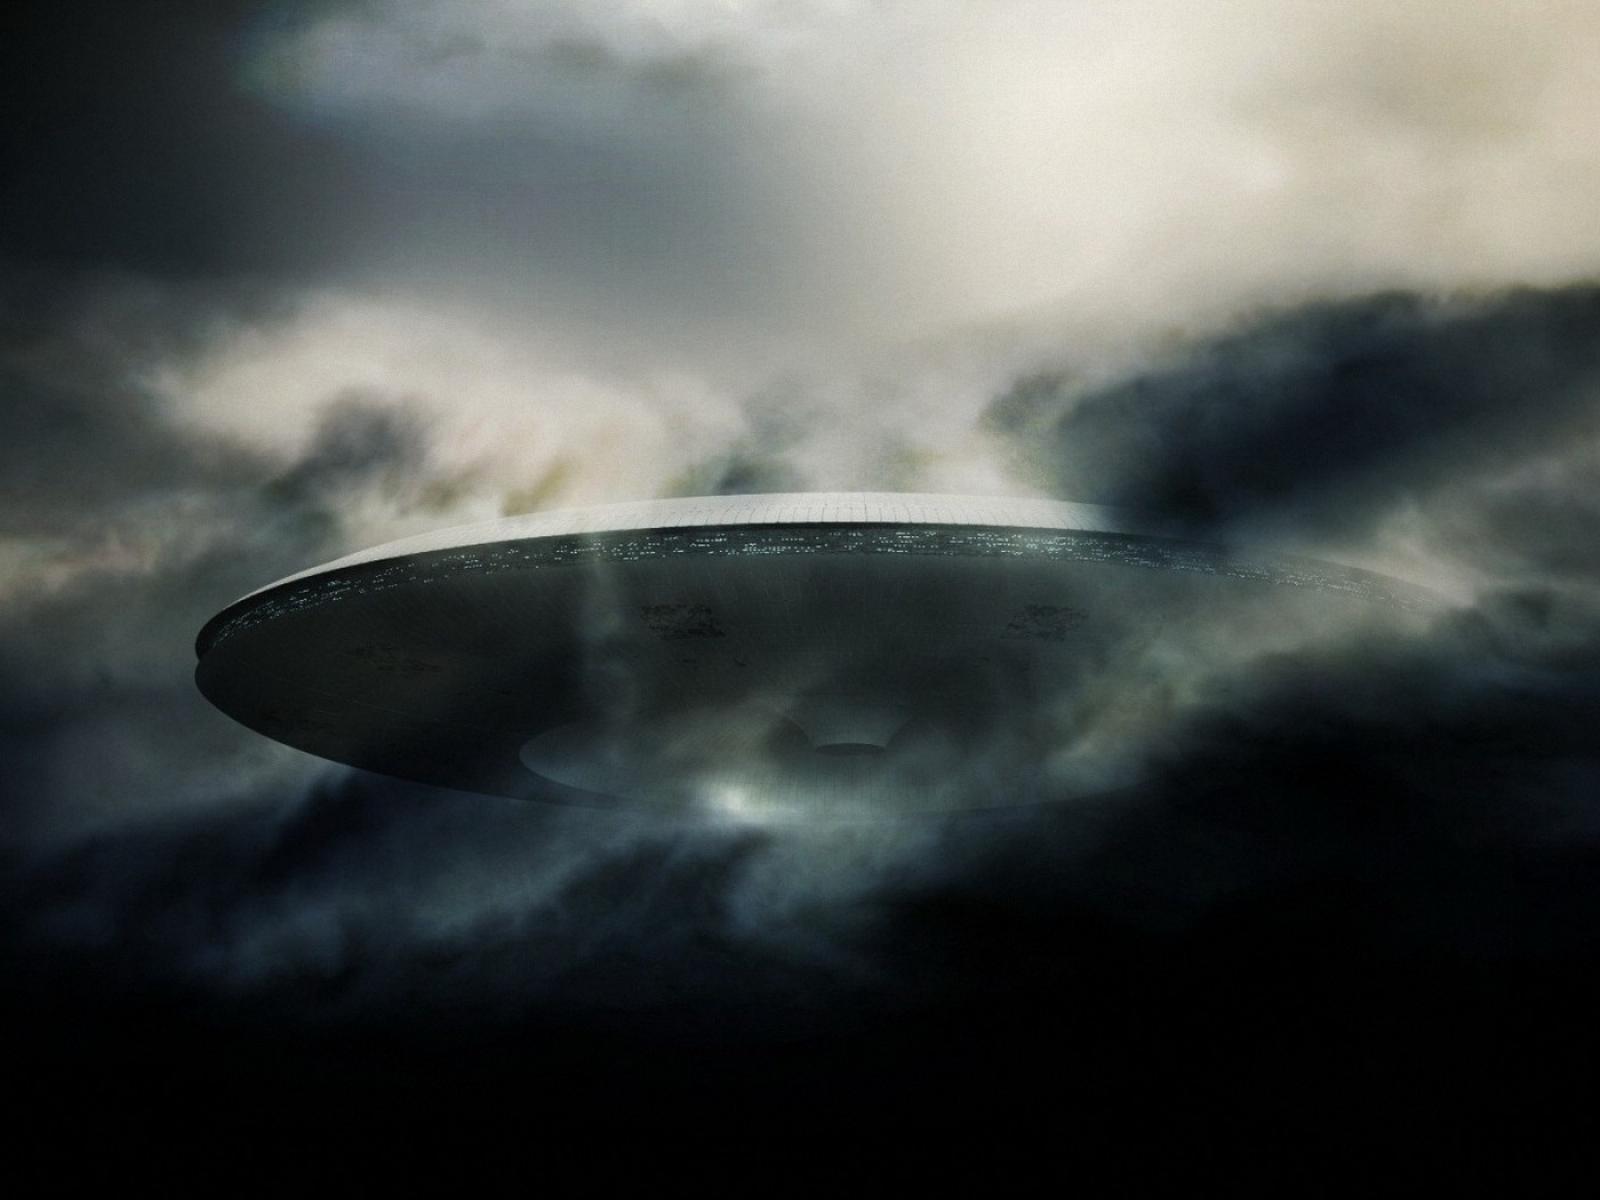 HD UFO Wallpapers Odaklan Evlat   Wallpaper 1600x1200